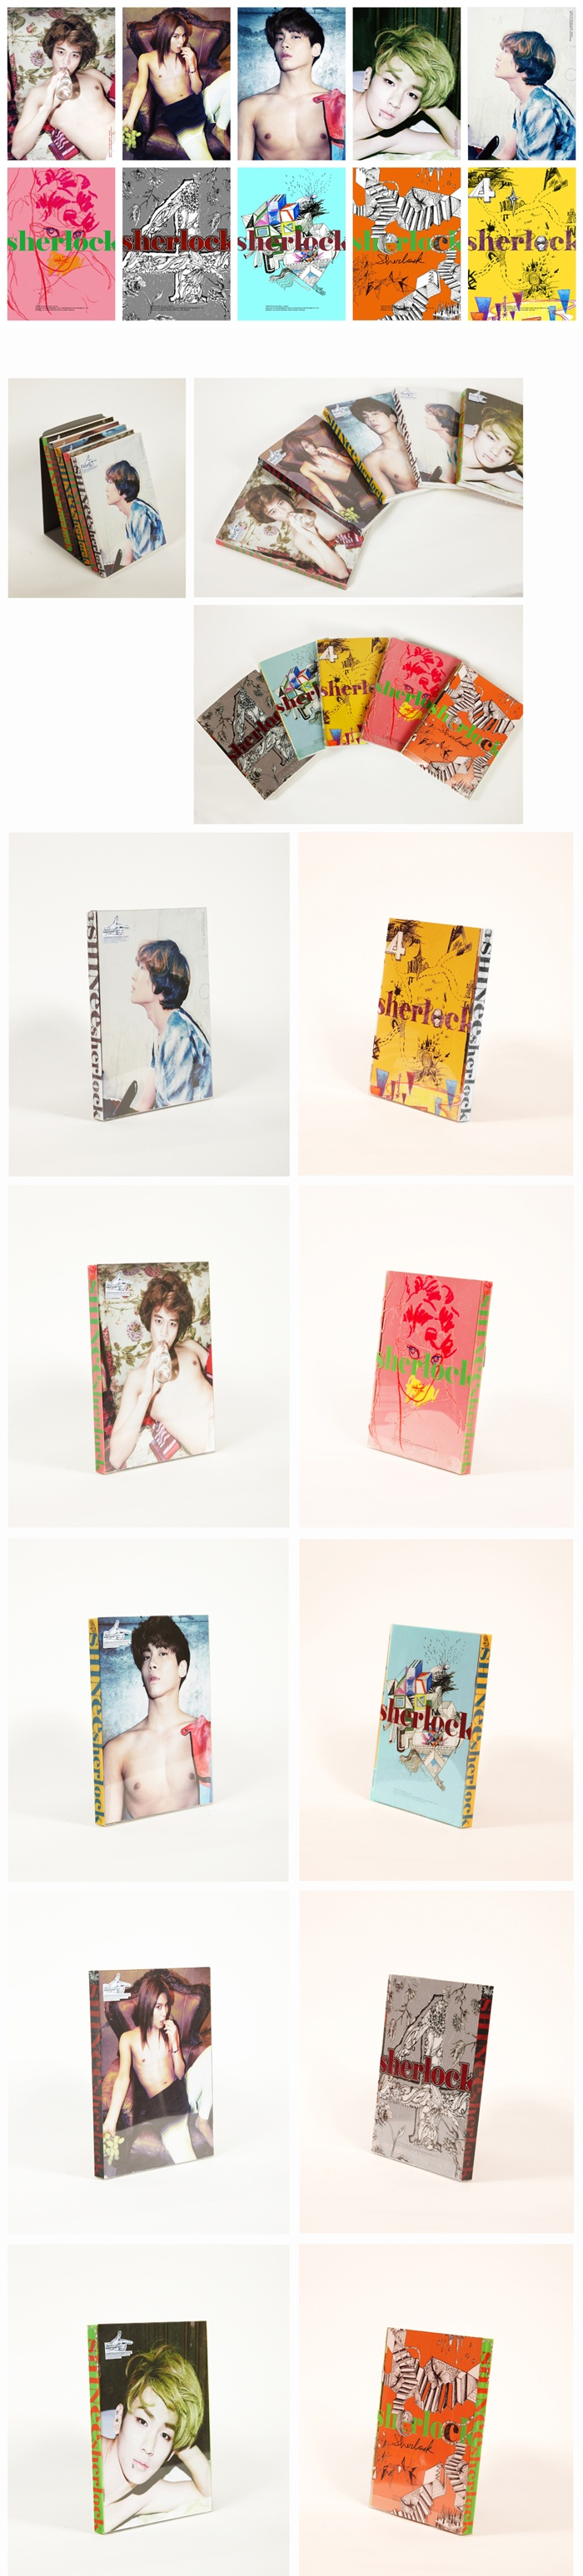 SHINee Sherlock Multiple Covers